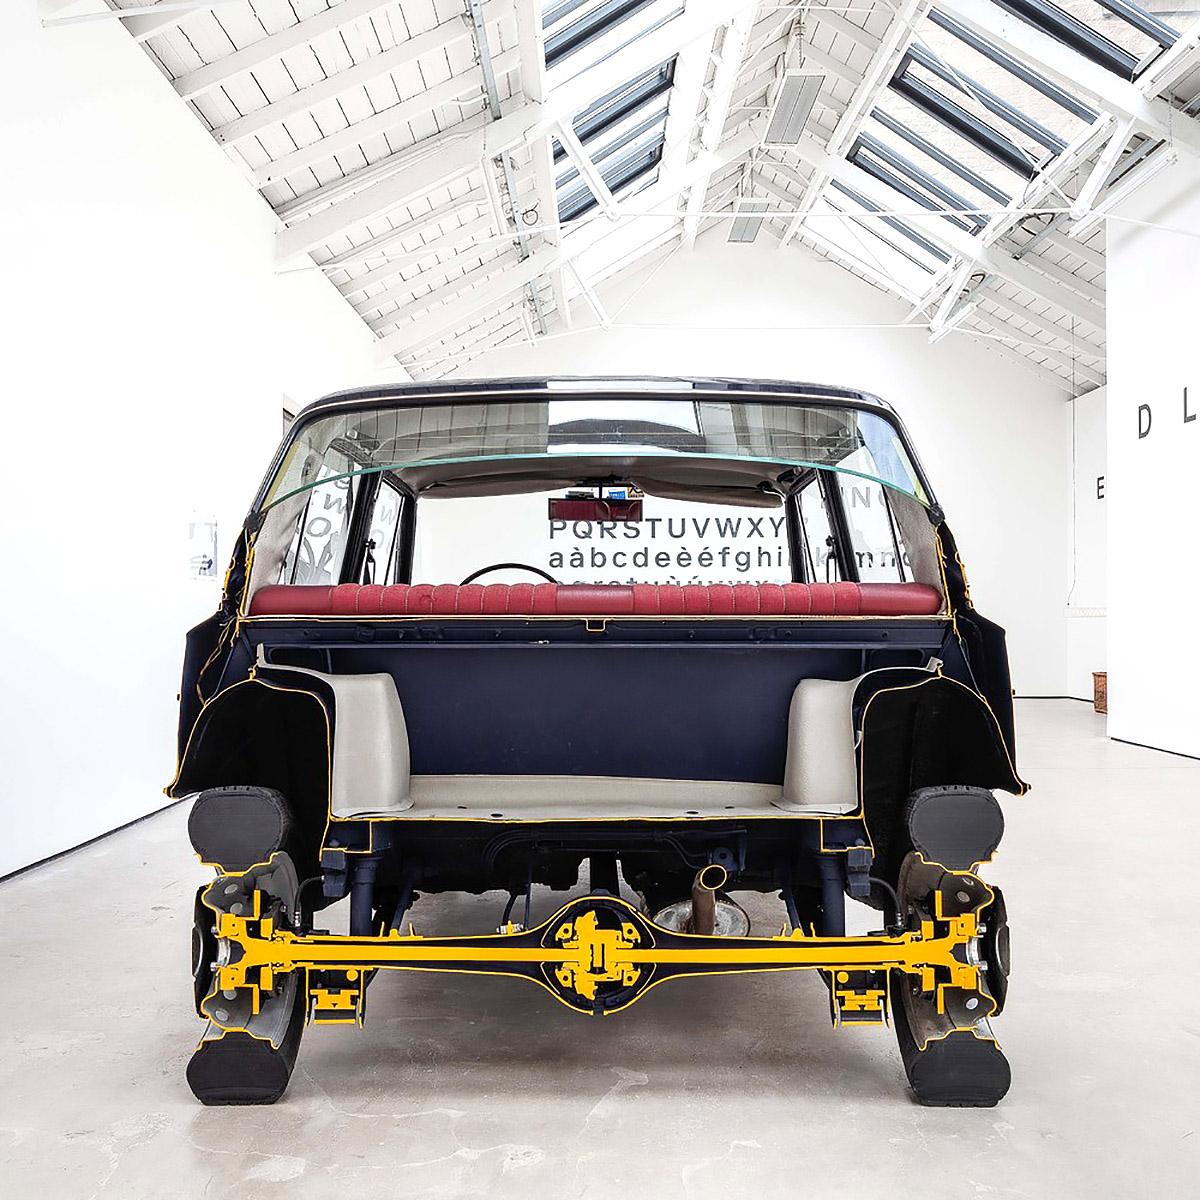 Simon Starling - A-A', B-B', Fiat 125 Special, 1968, Cutaway View, detail